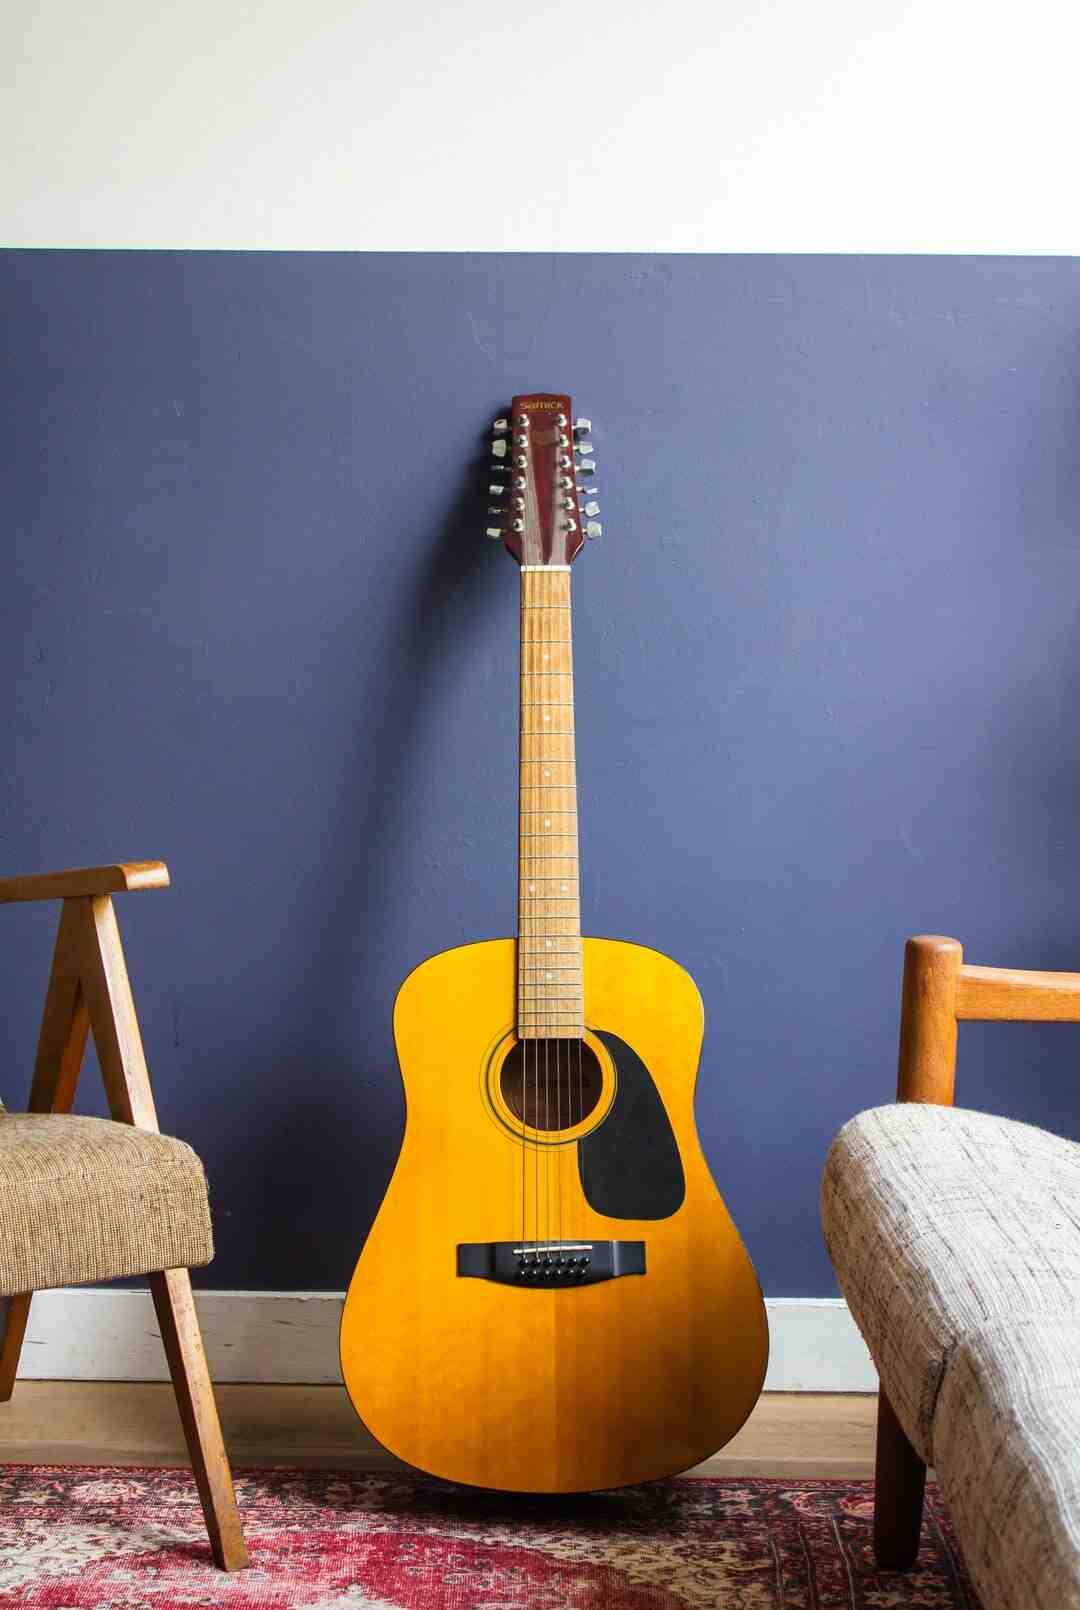 Comment accorder une guitare